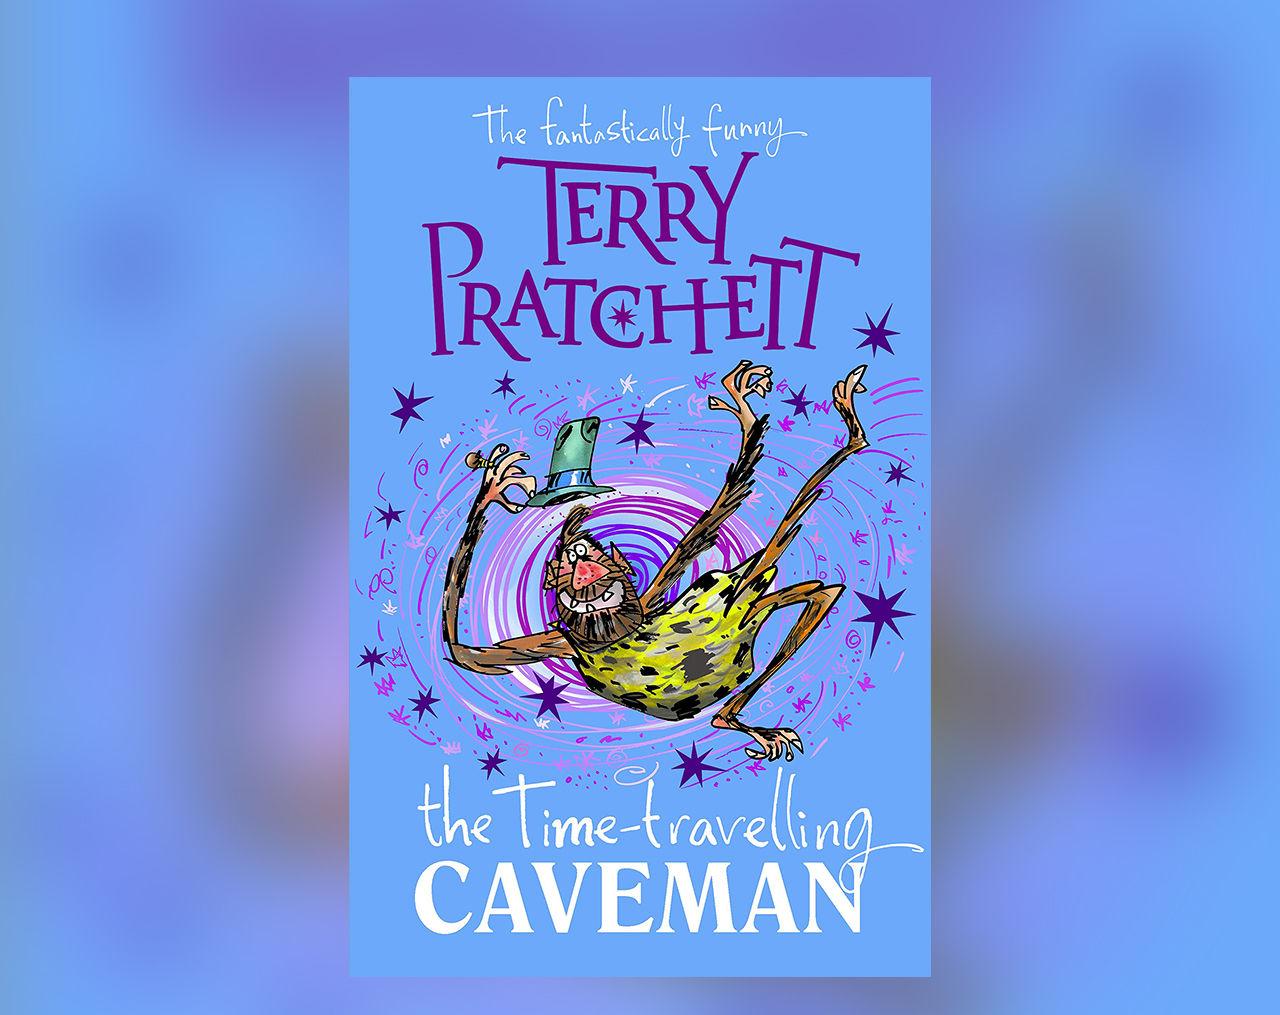 Ny Terry Pratchett-bok släpps i september